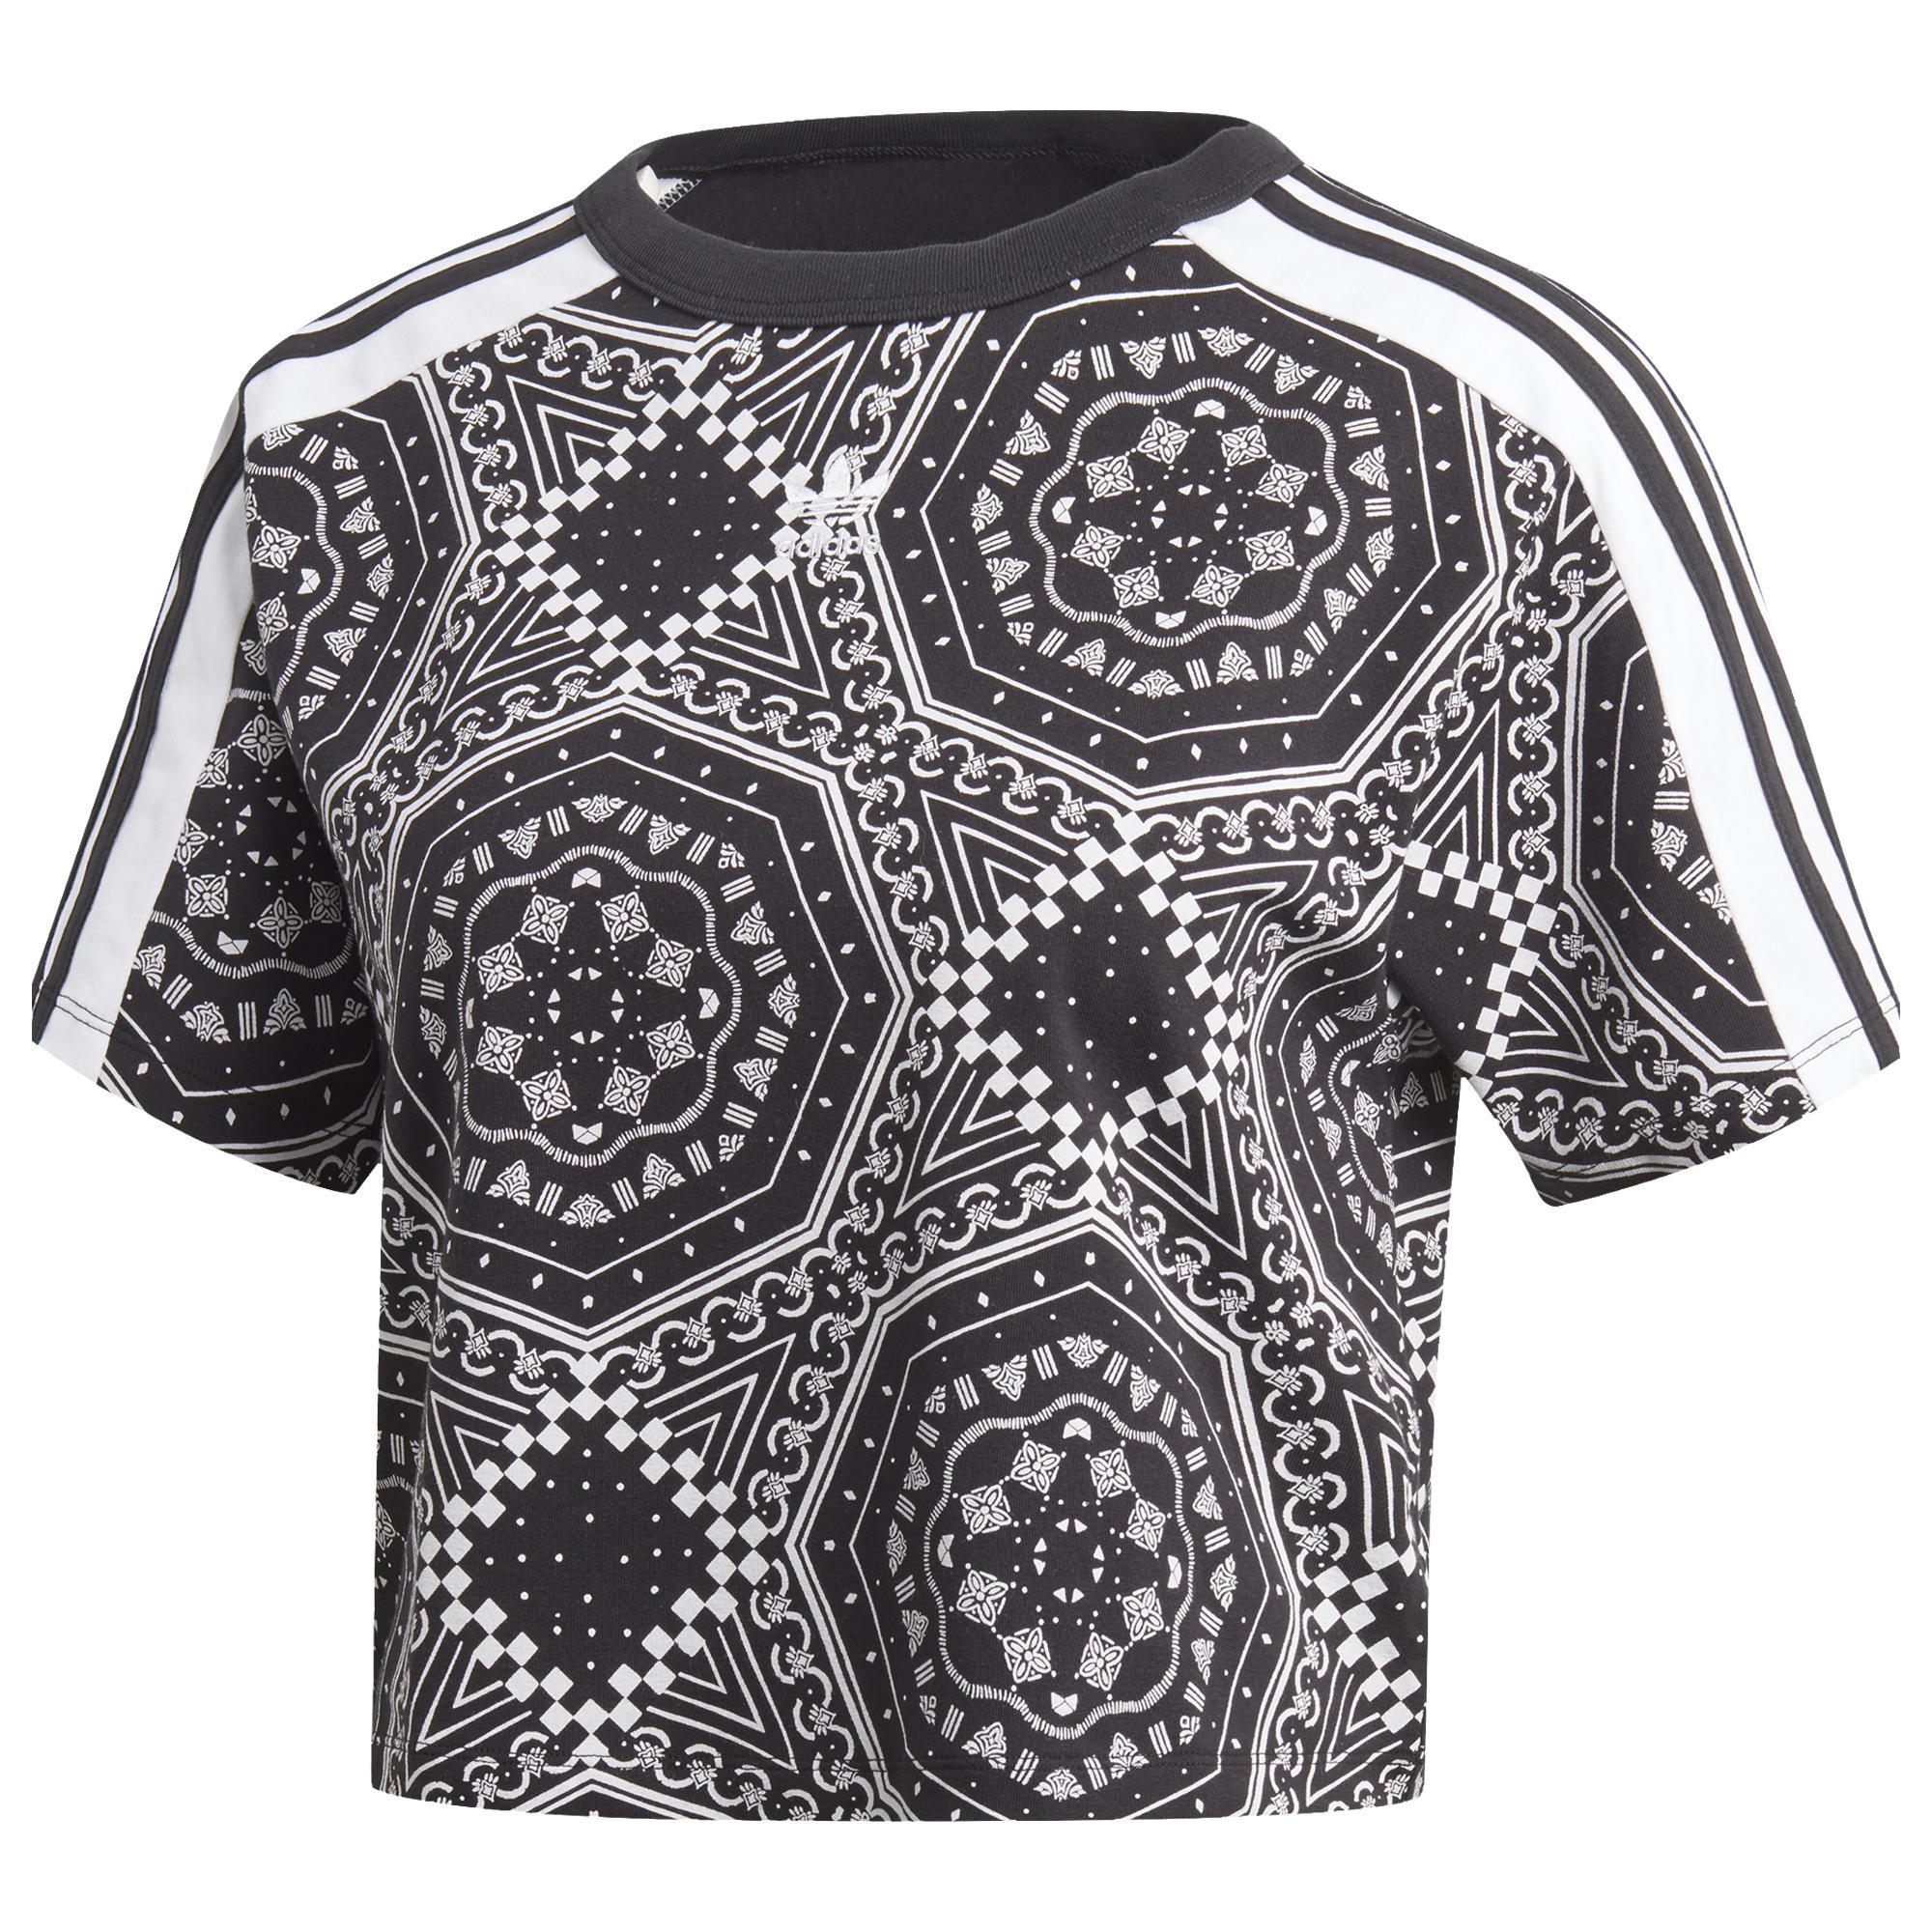 f0e15b16234330 Lyst - adidas Originals Strict clash Trefoil Crop T-shirt in Black